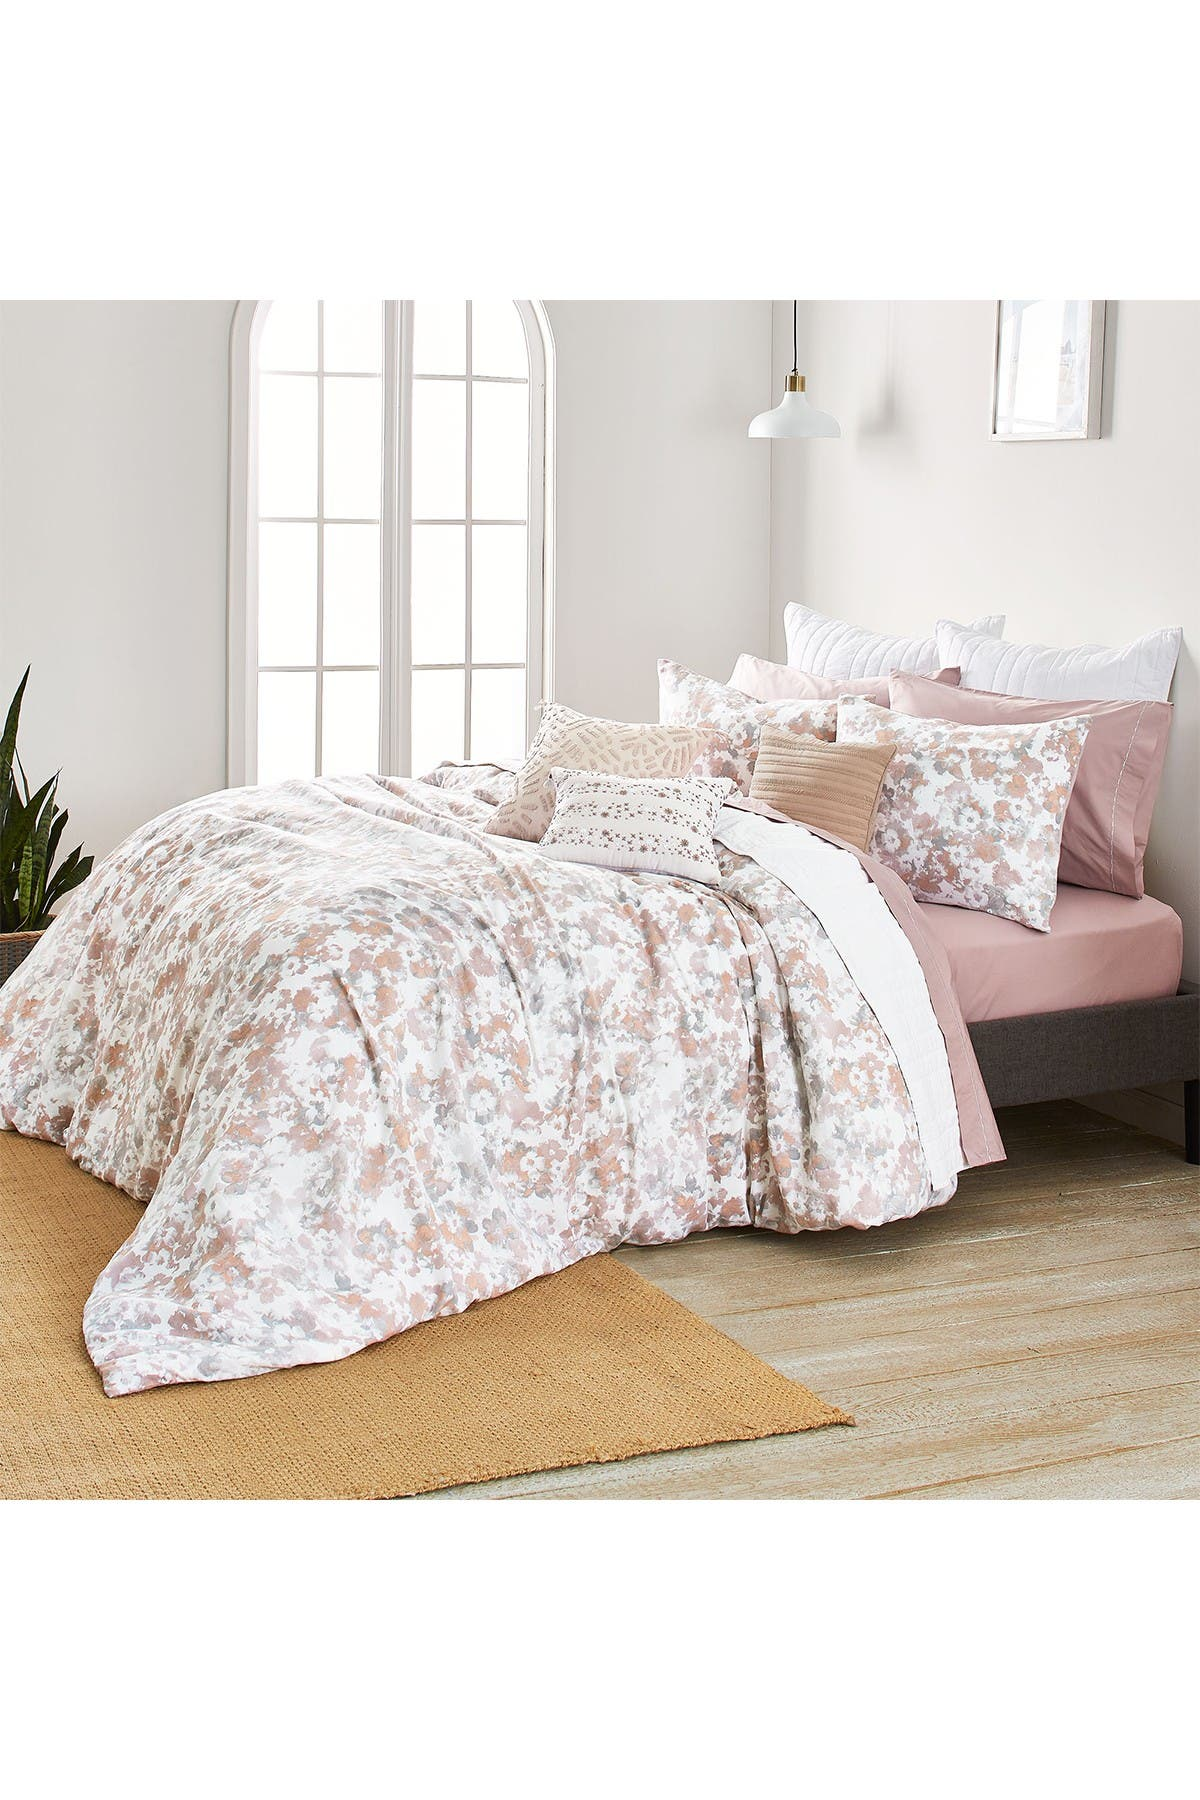 Image of SPLENDID HOME DECOR King Marin Cotton Comforter 3-Piece Set - Mist